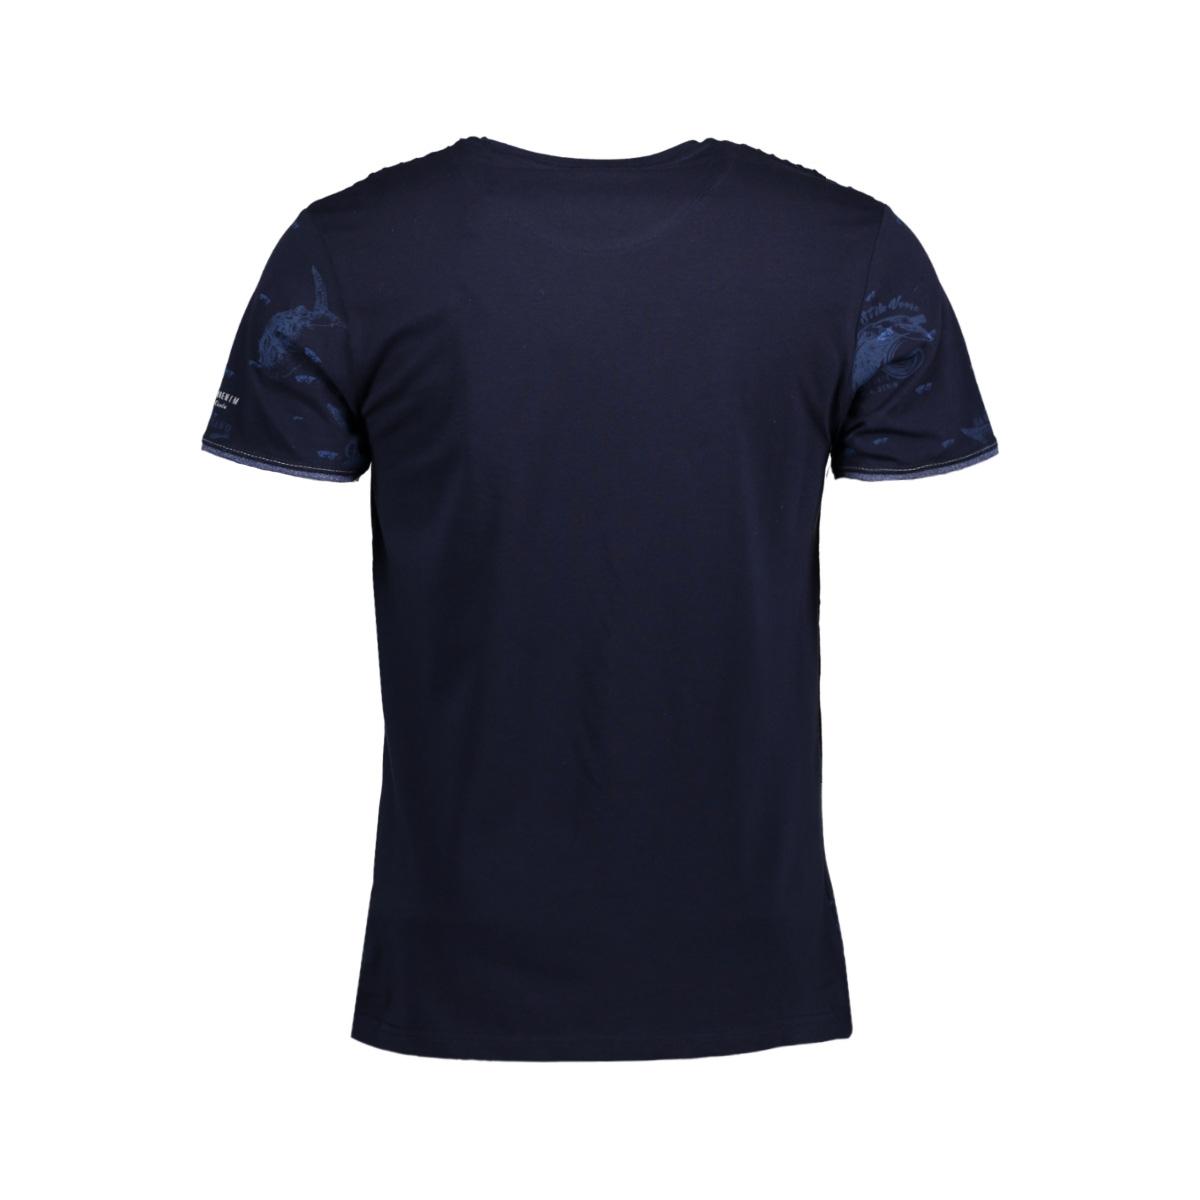 13886 gabbiano t-shirt navy